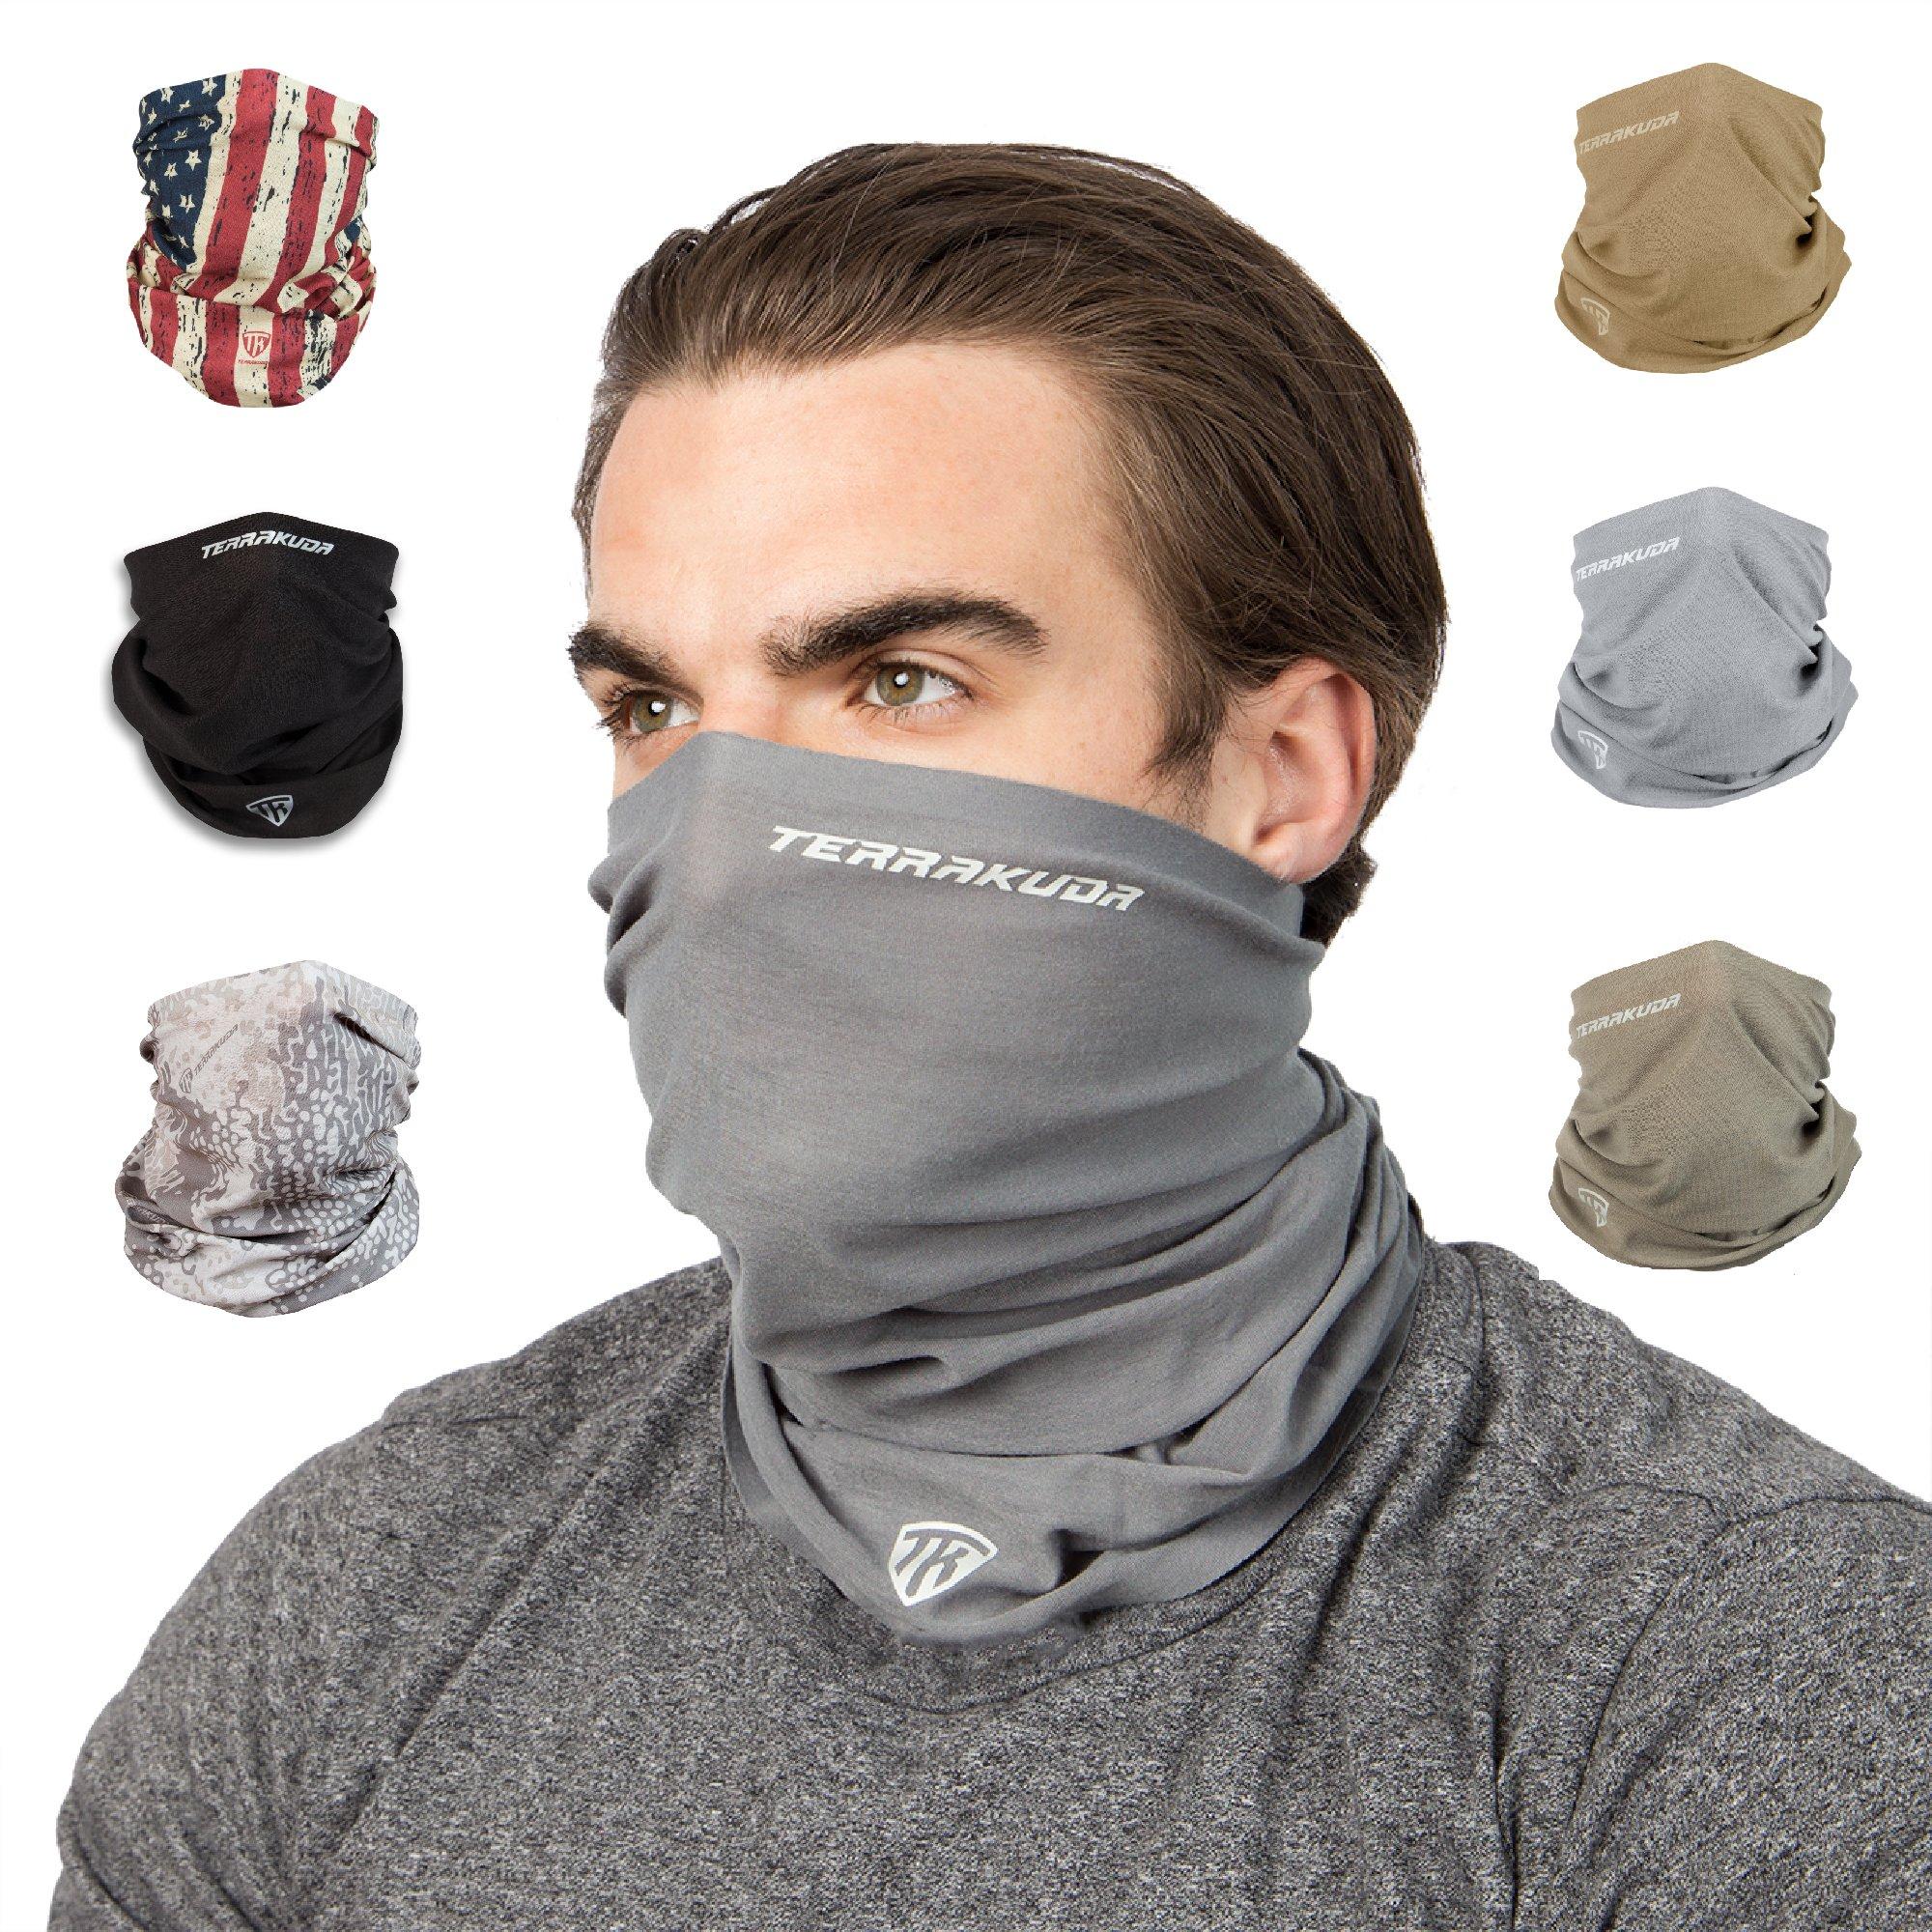 Terra Kuda Face Clothing Neck Gaiter Mask - Non Slip Light Breathable for Sun Wind Dust Bandana Balaclava (Wolf Grey) by Terra Kuda